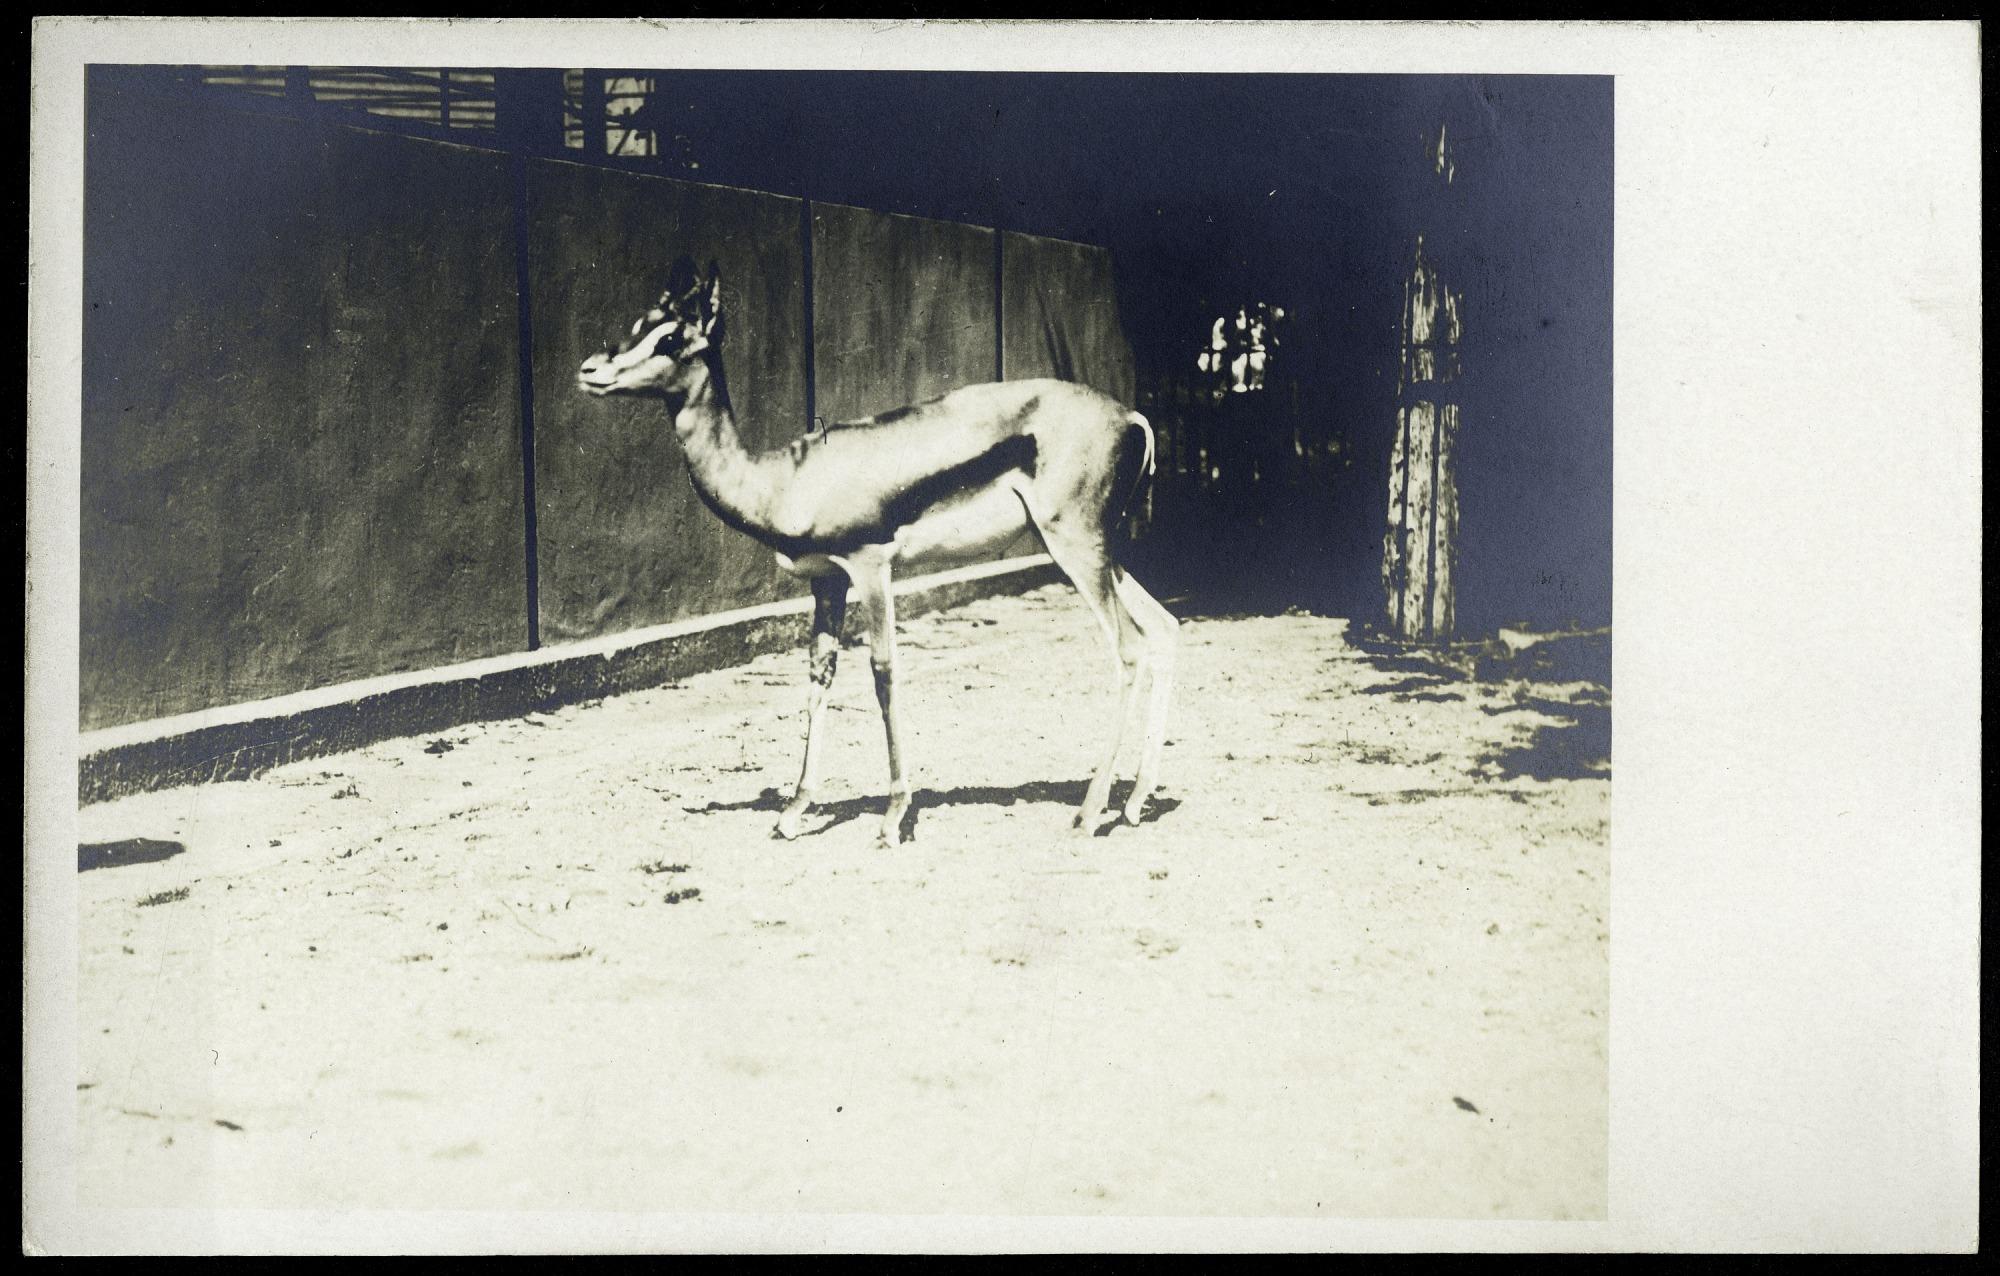 Postcard of a Gazelle